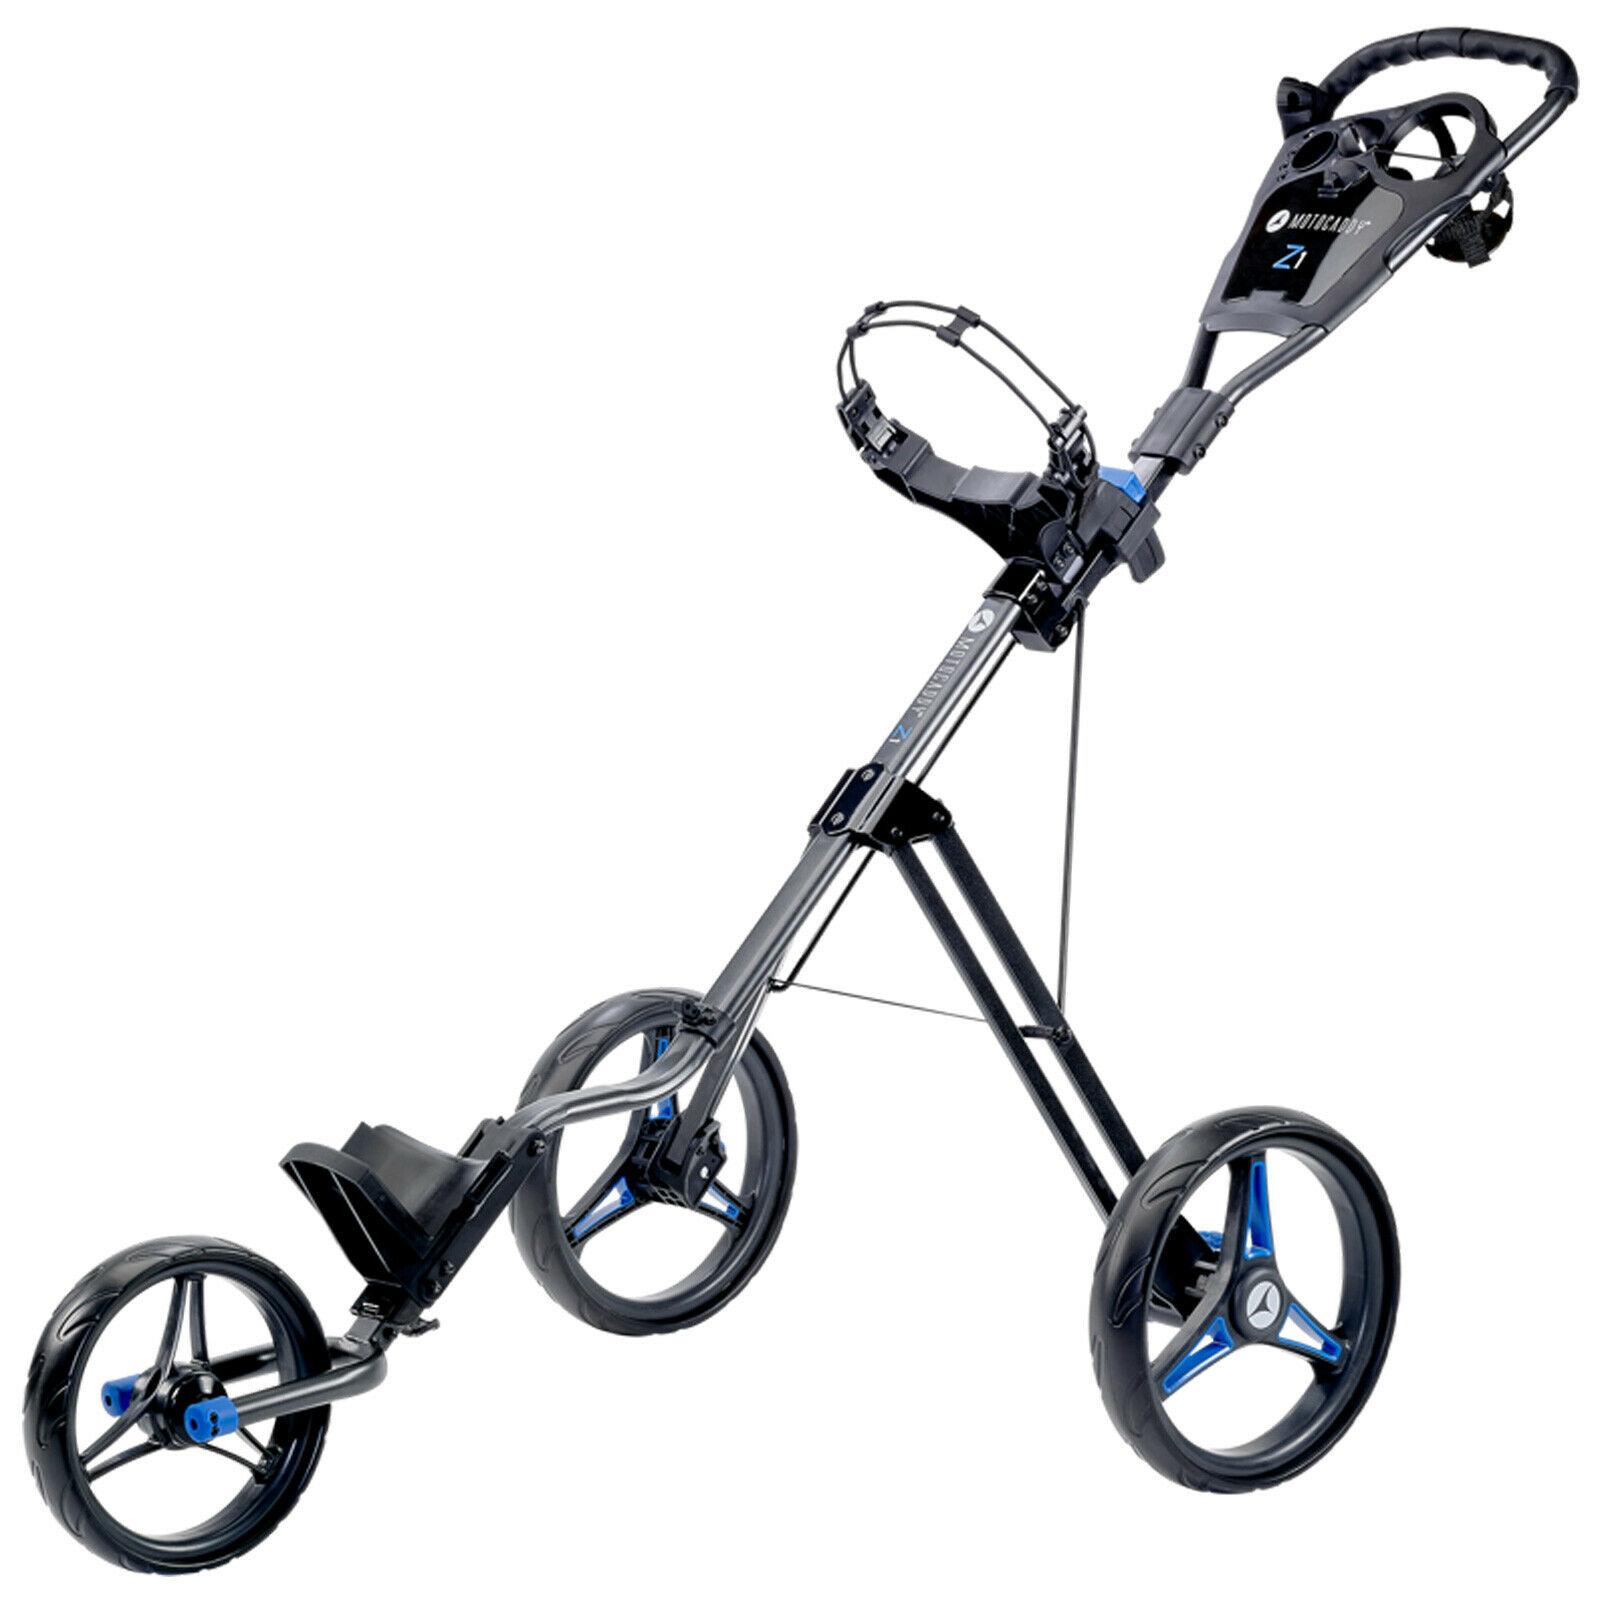 2021 Motocaddy Push Golf Trolley Three Wheel Cart Easy Foldable Lightweight £84.18 ebay / moresportsoutlet